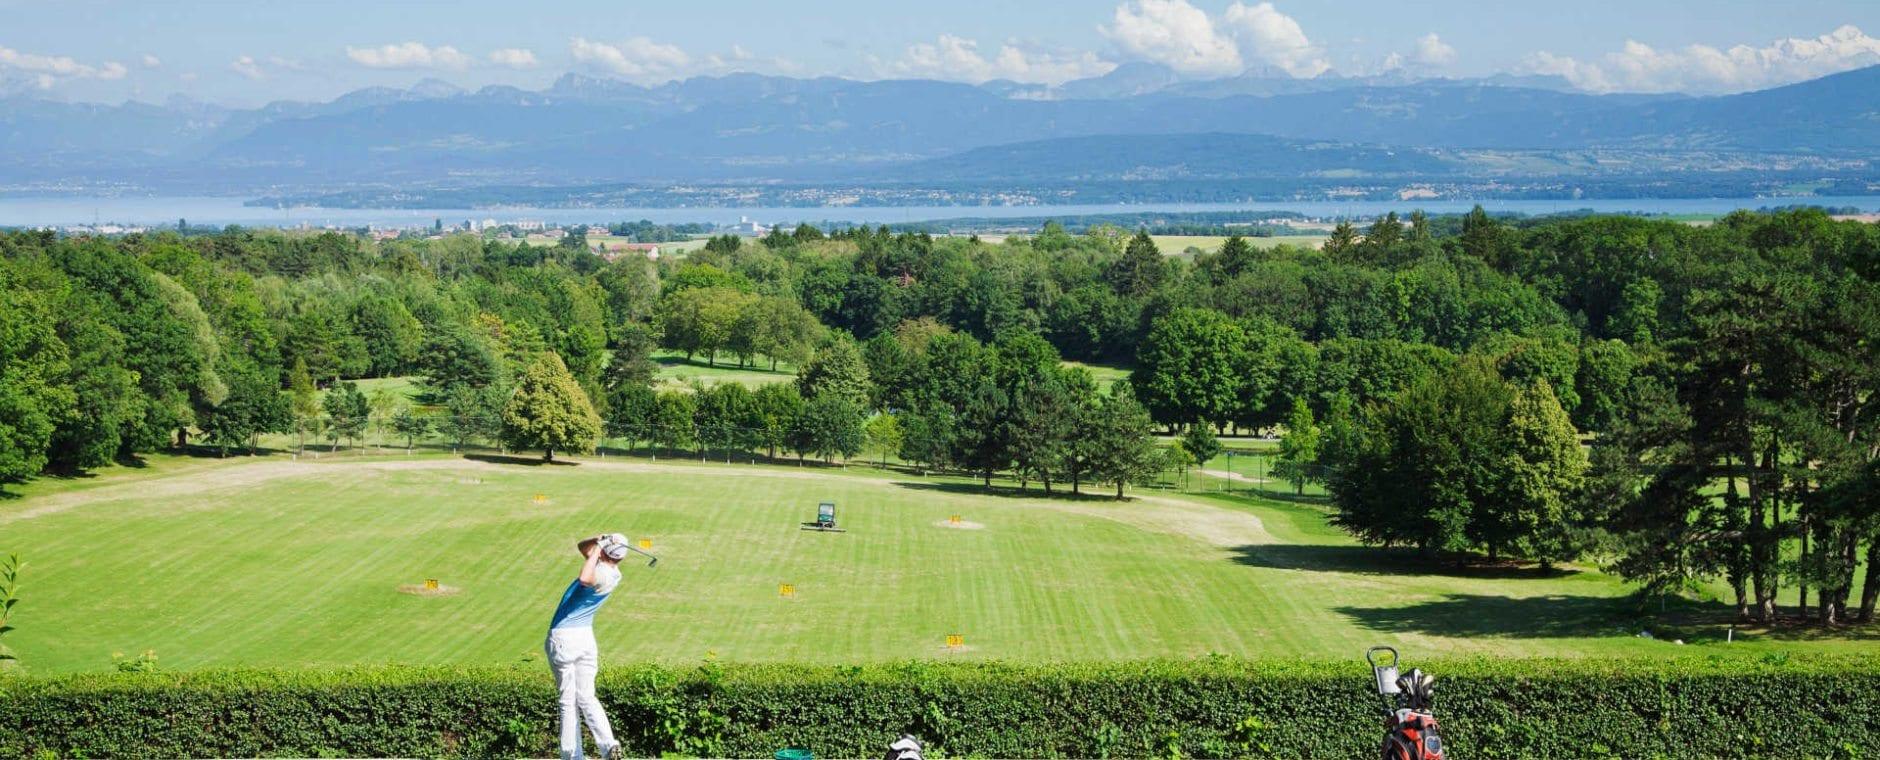 practice golf Bonmont vue Mont Blanc